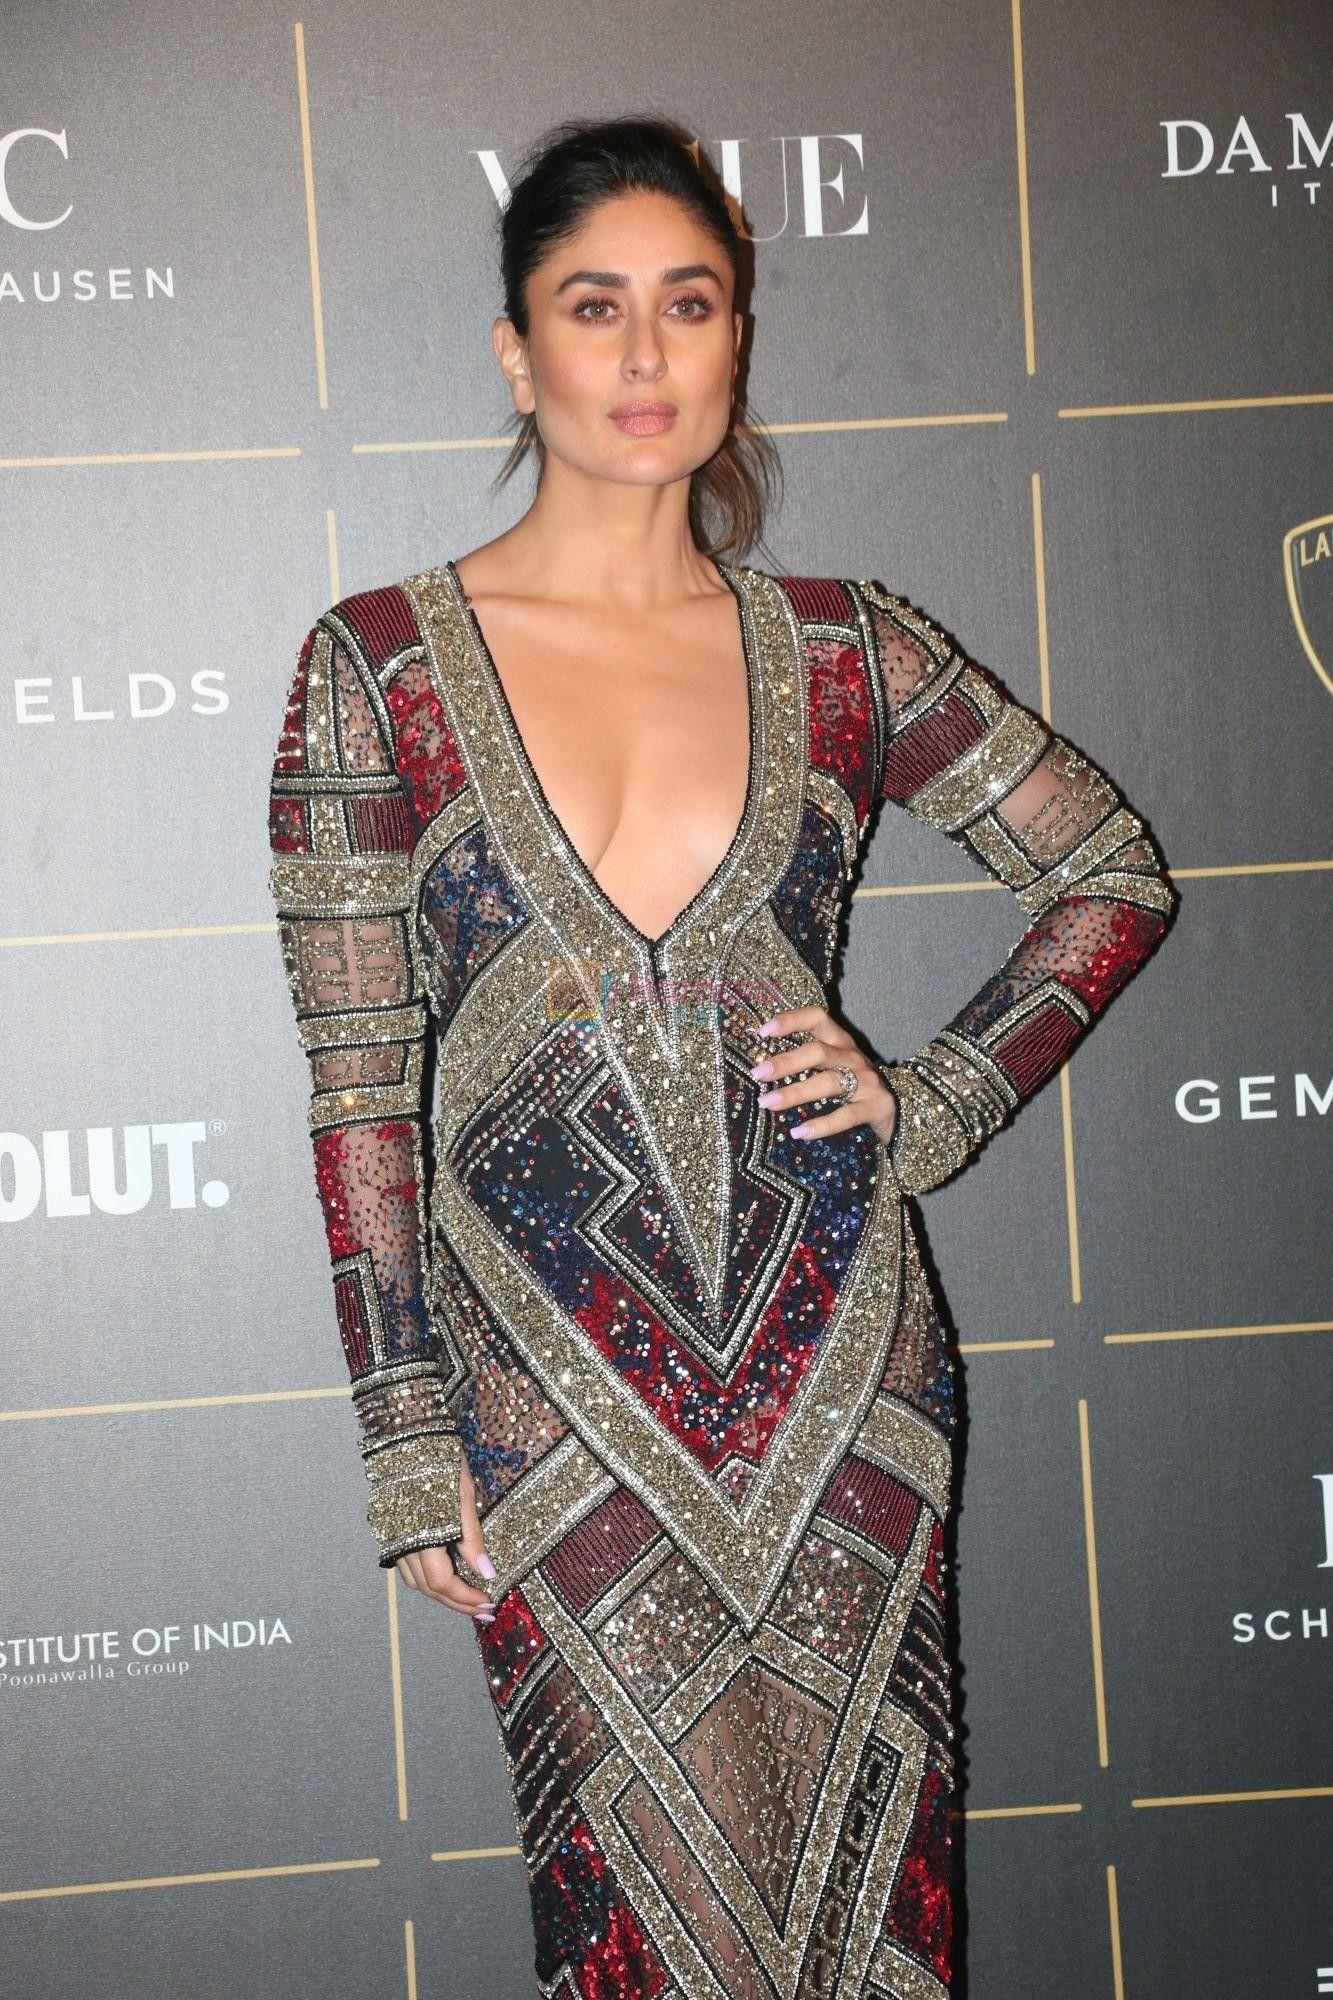 Bollywood Celebrities Bollywood Actress Trendy Dresses Sexy Dresses Fashion Dresses Kareena